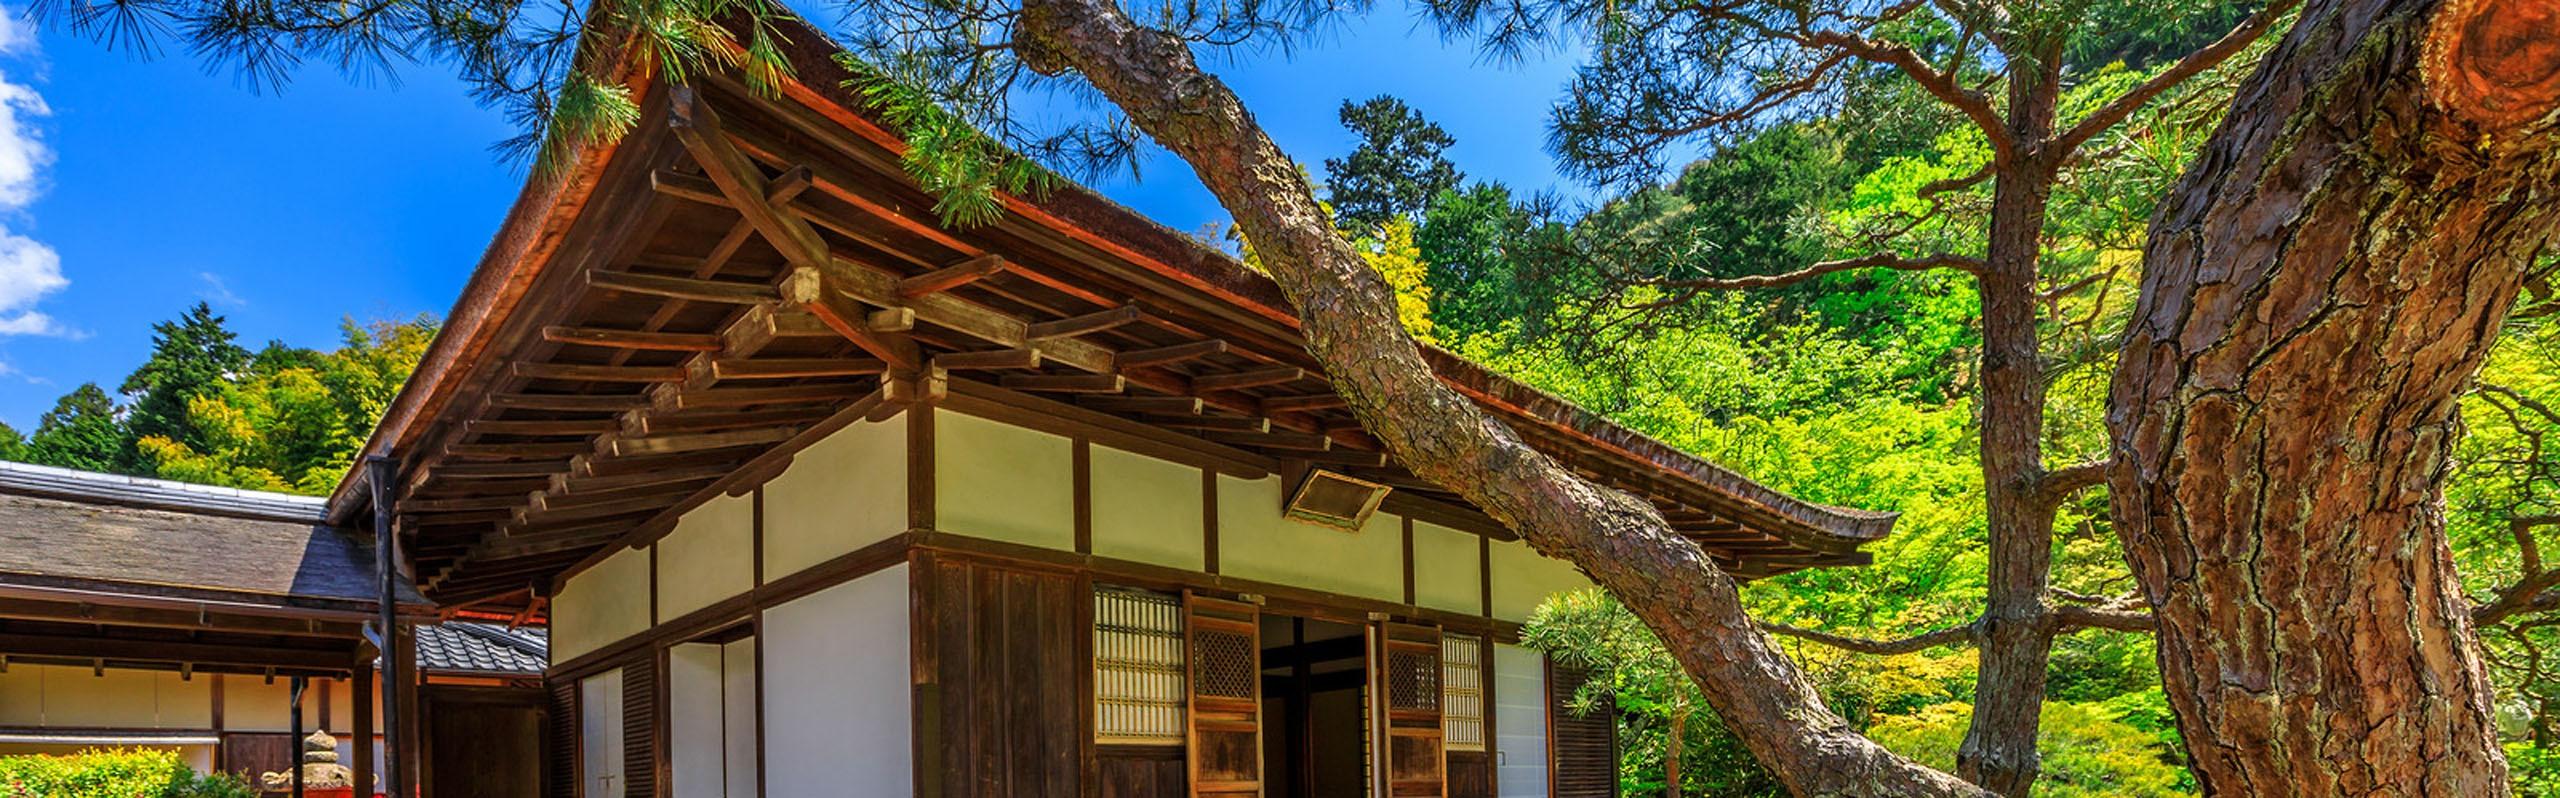 Traditional Accommodation in Japan - Ryokan